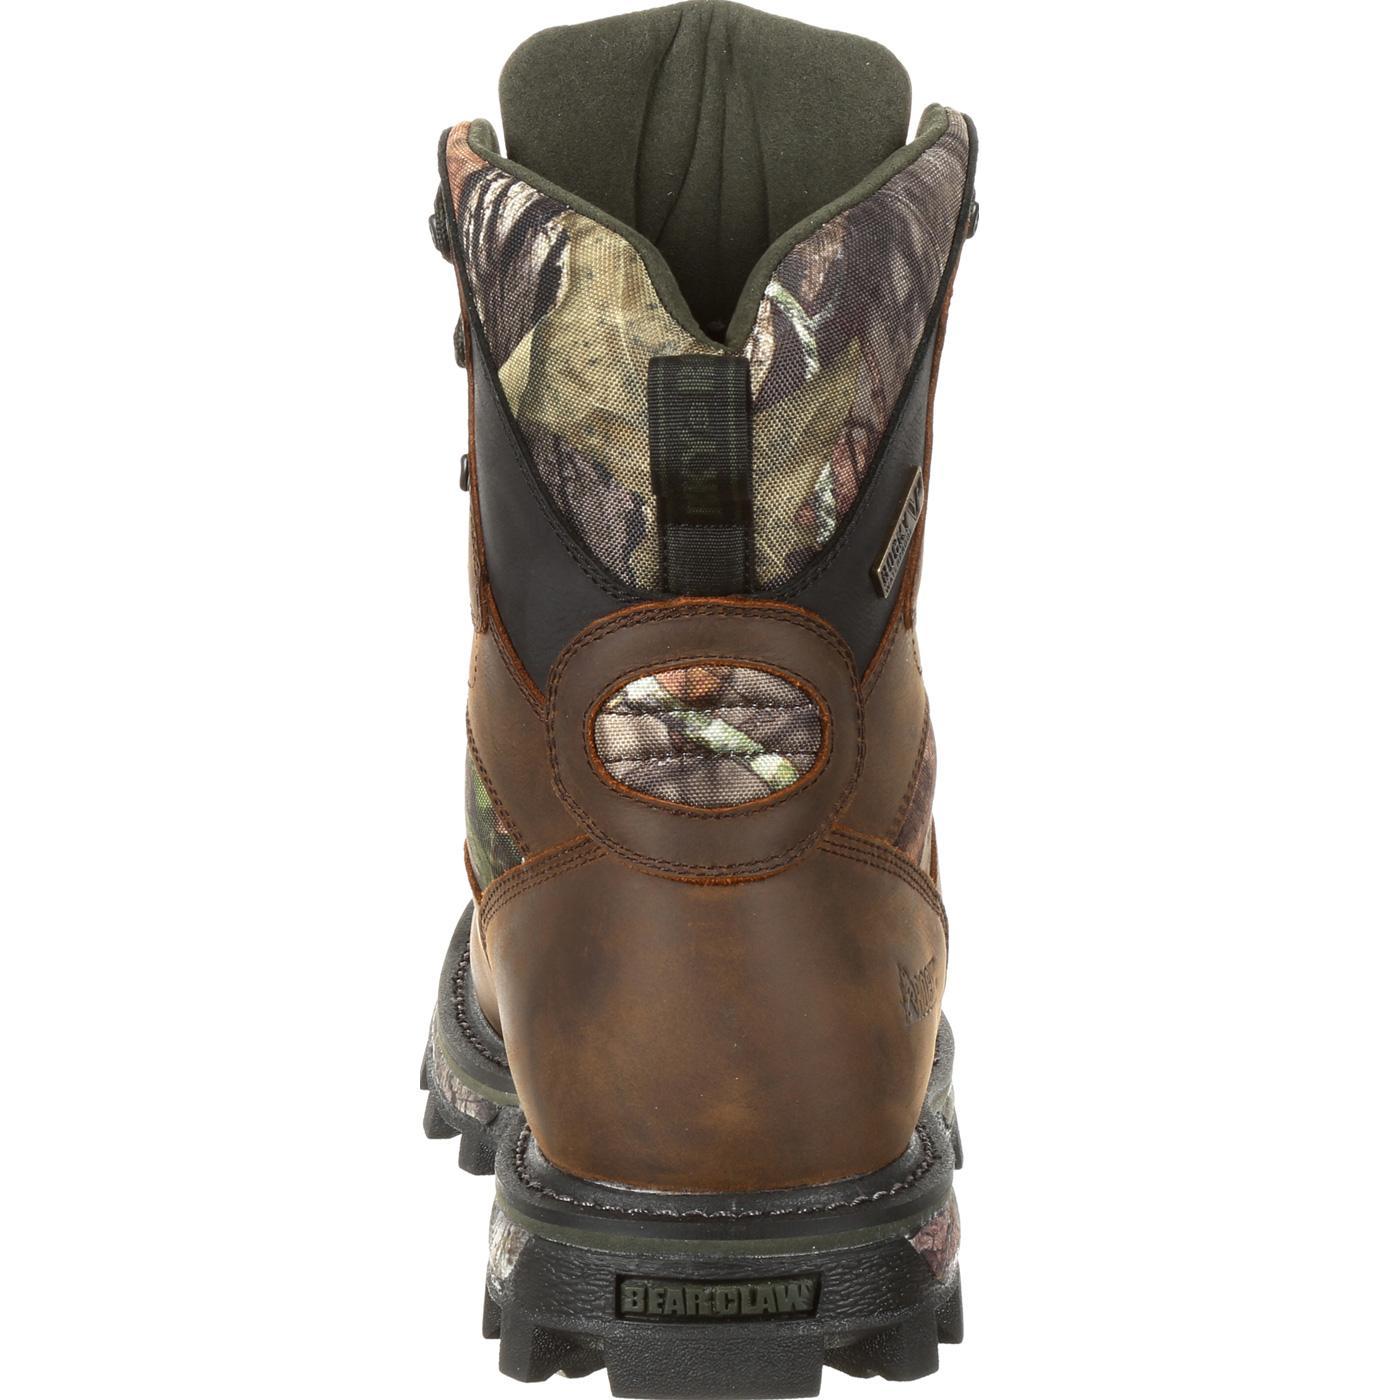 f61b2c389d6 Rocky BearClaw FX 800G Insulated Waterproof Mossy Oak® Camo Outdoor Boot